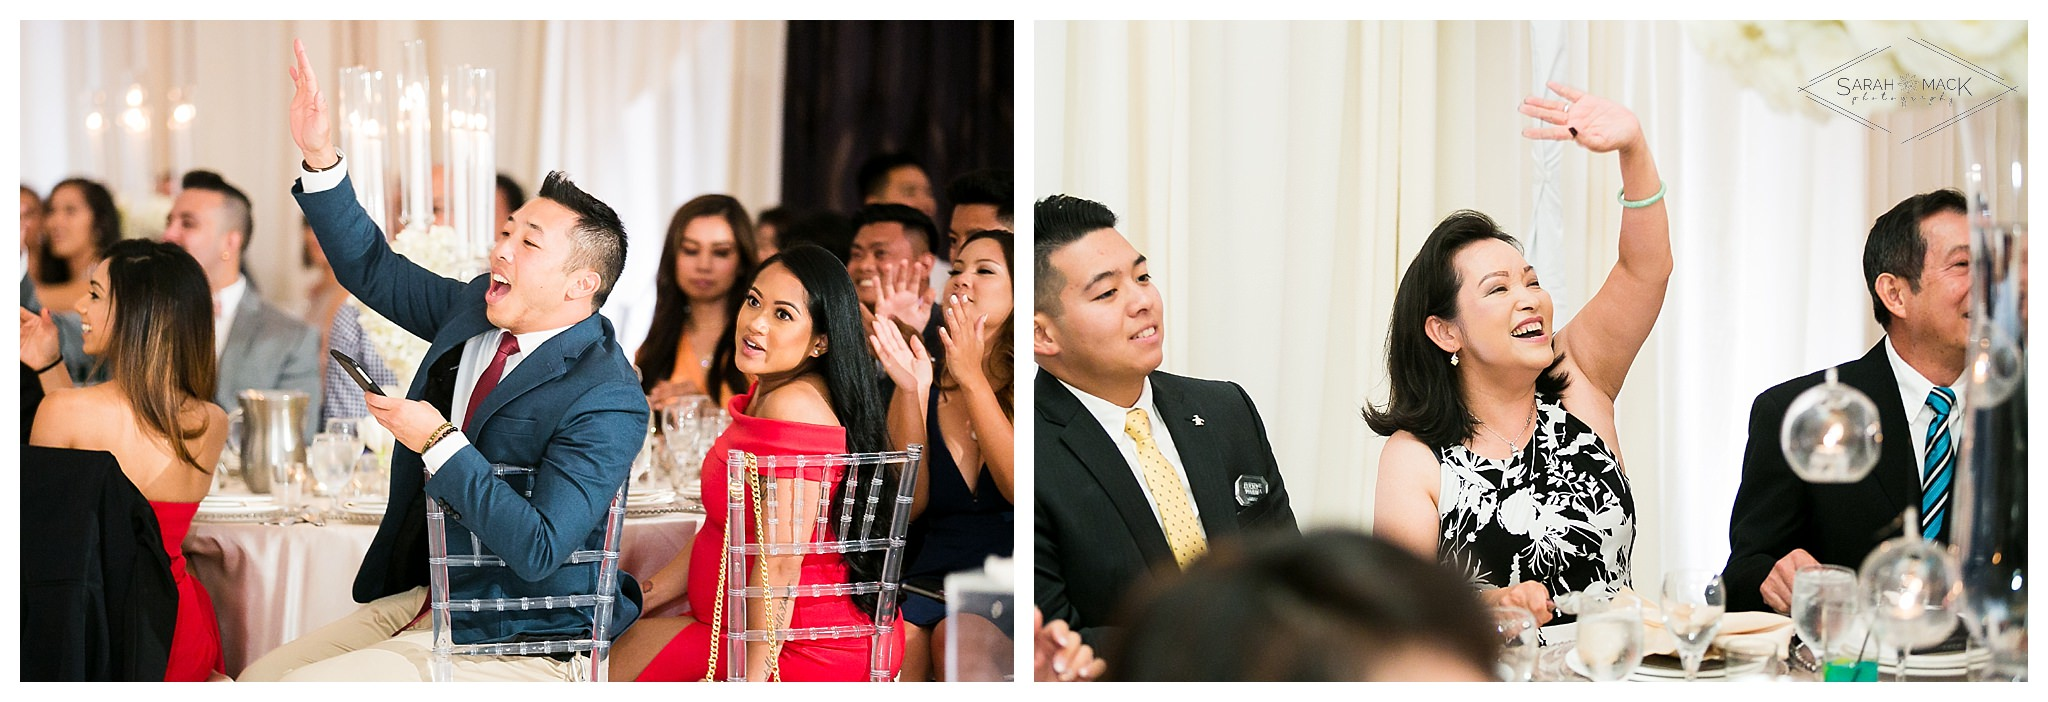 LE-Avenue-of-the-Arts-Costa-Mesa-Wedding-Photography-0175.jpg